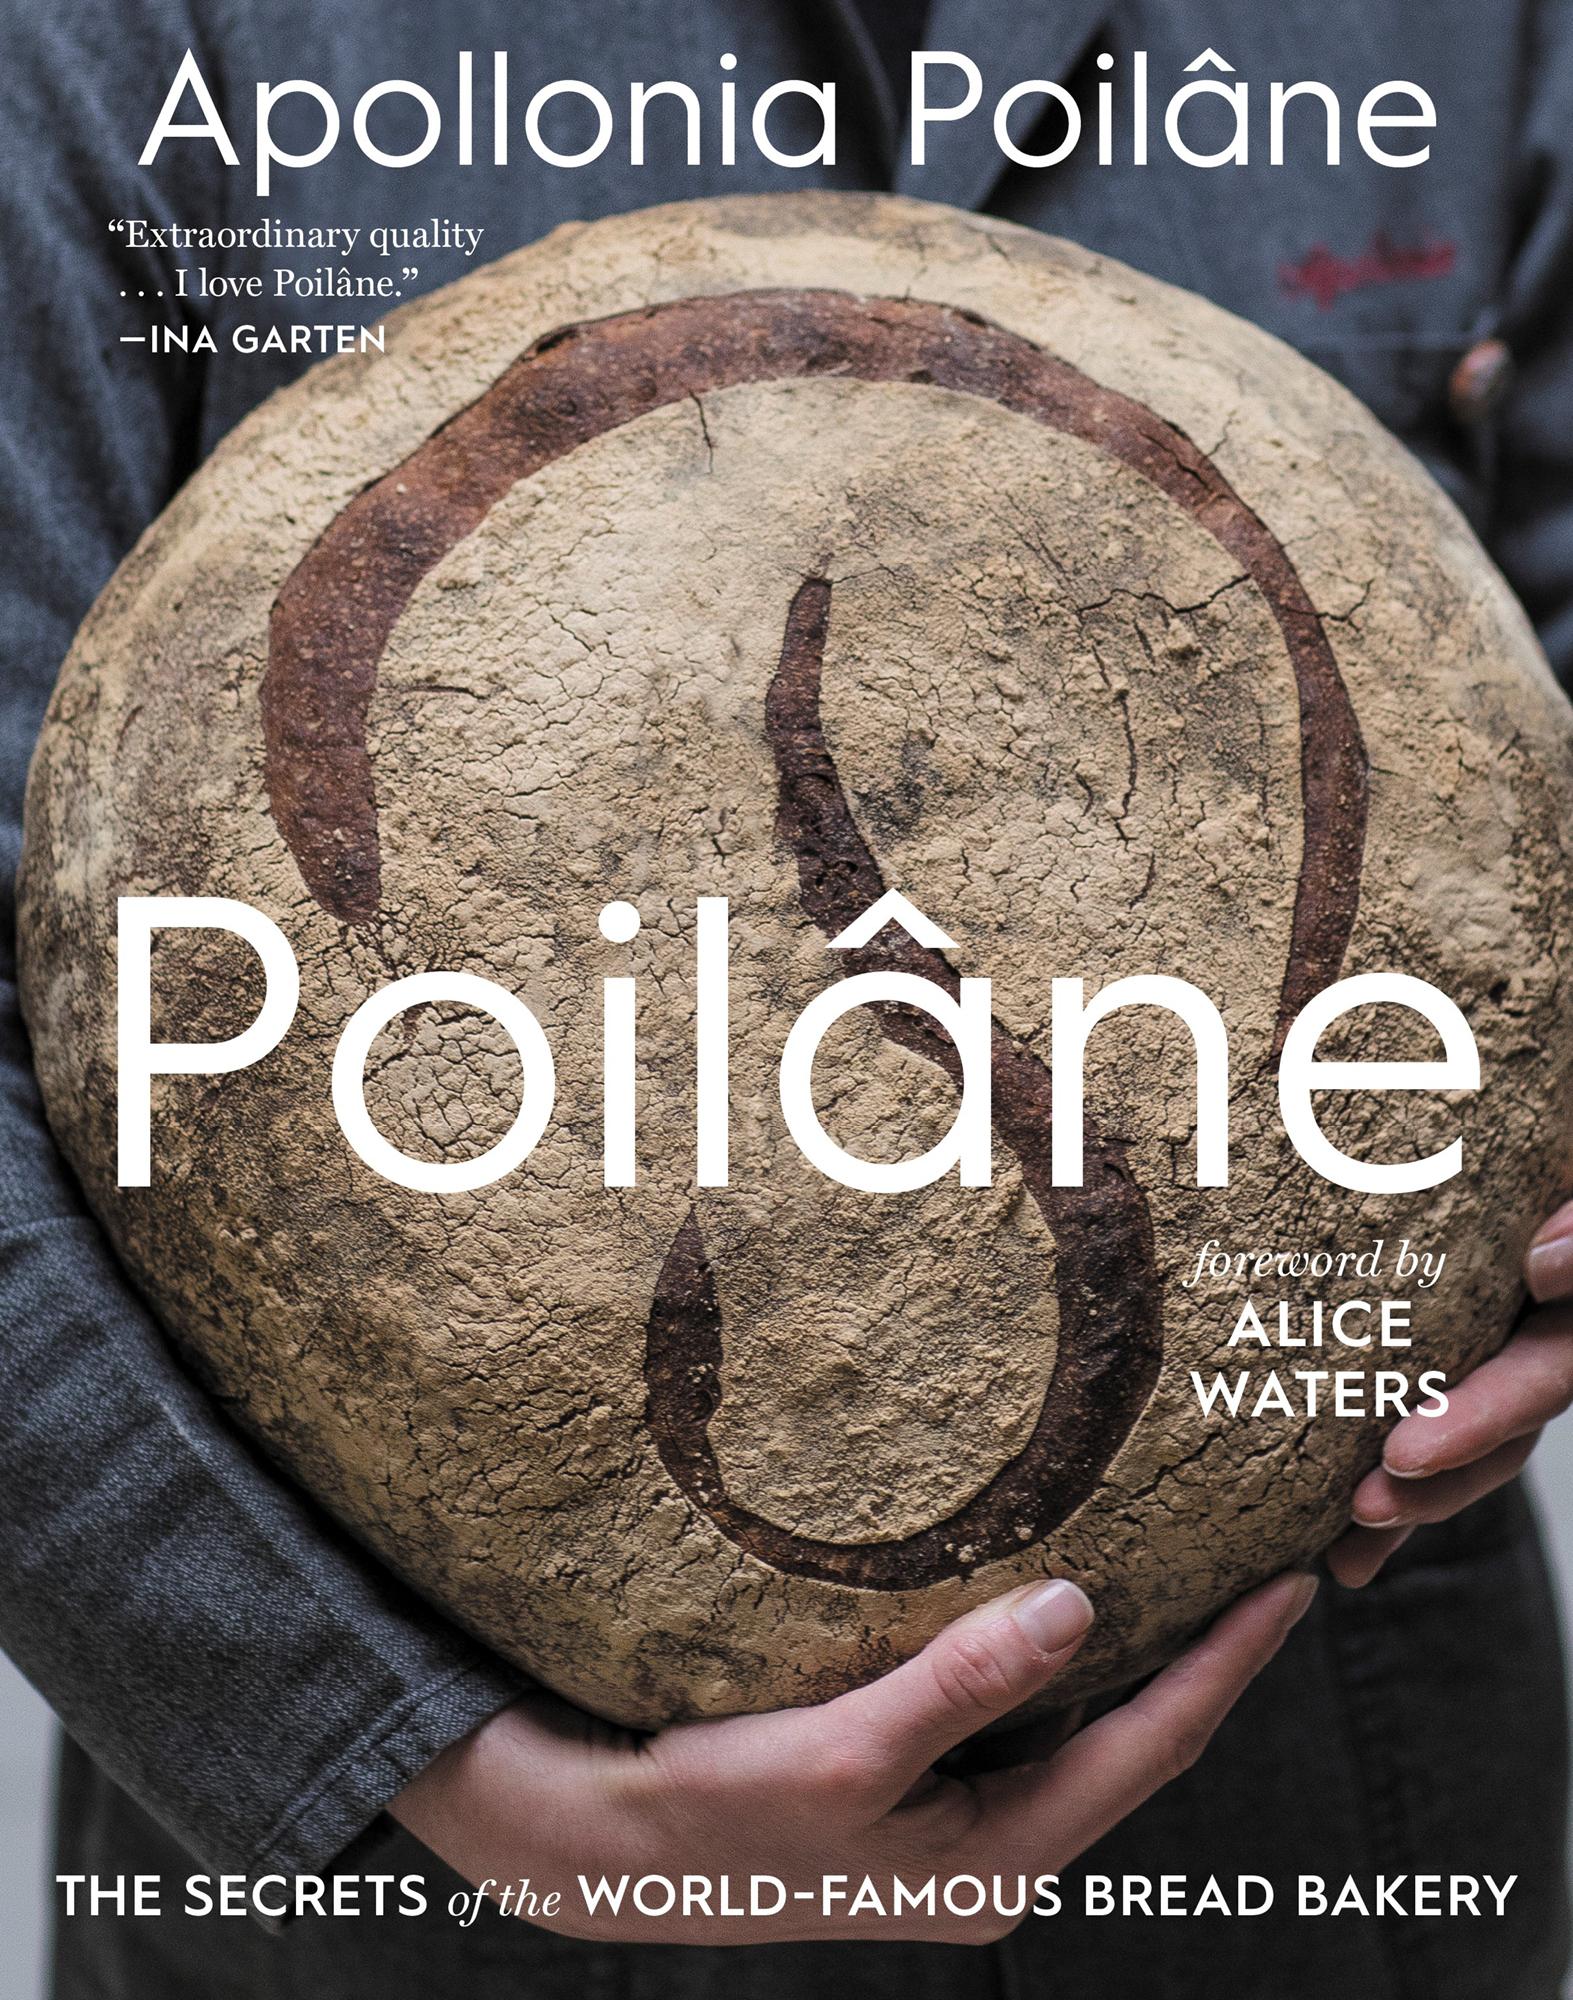 Apollonia Poilâne's very first cookbook - Poilâne: The Secrets of the World-Famous Bread Bakery